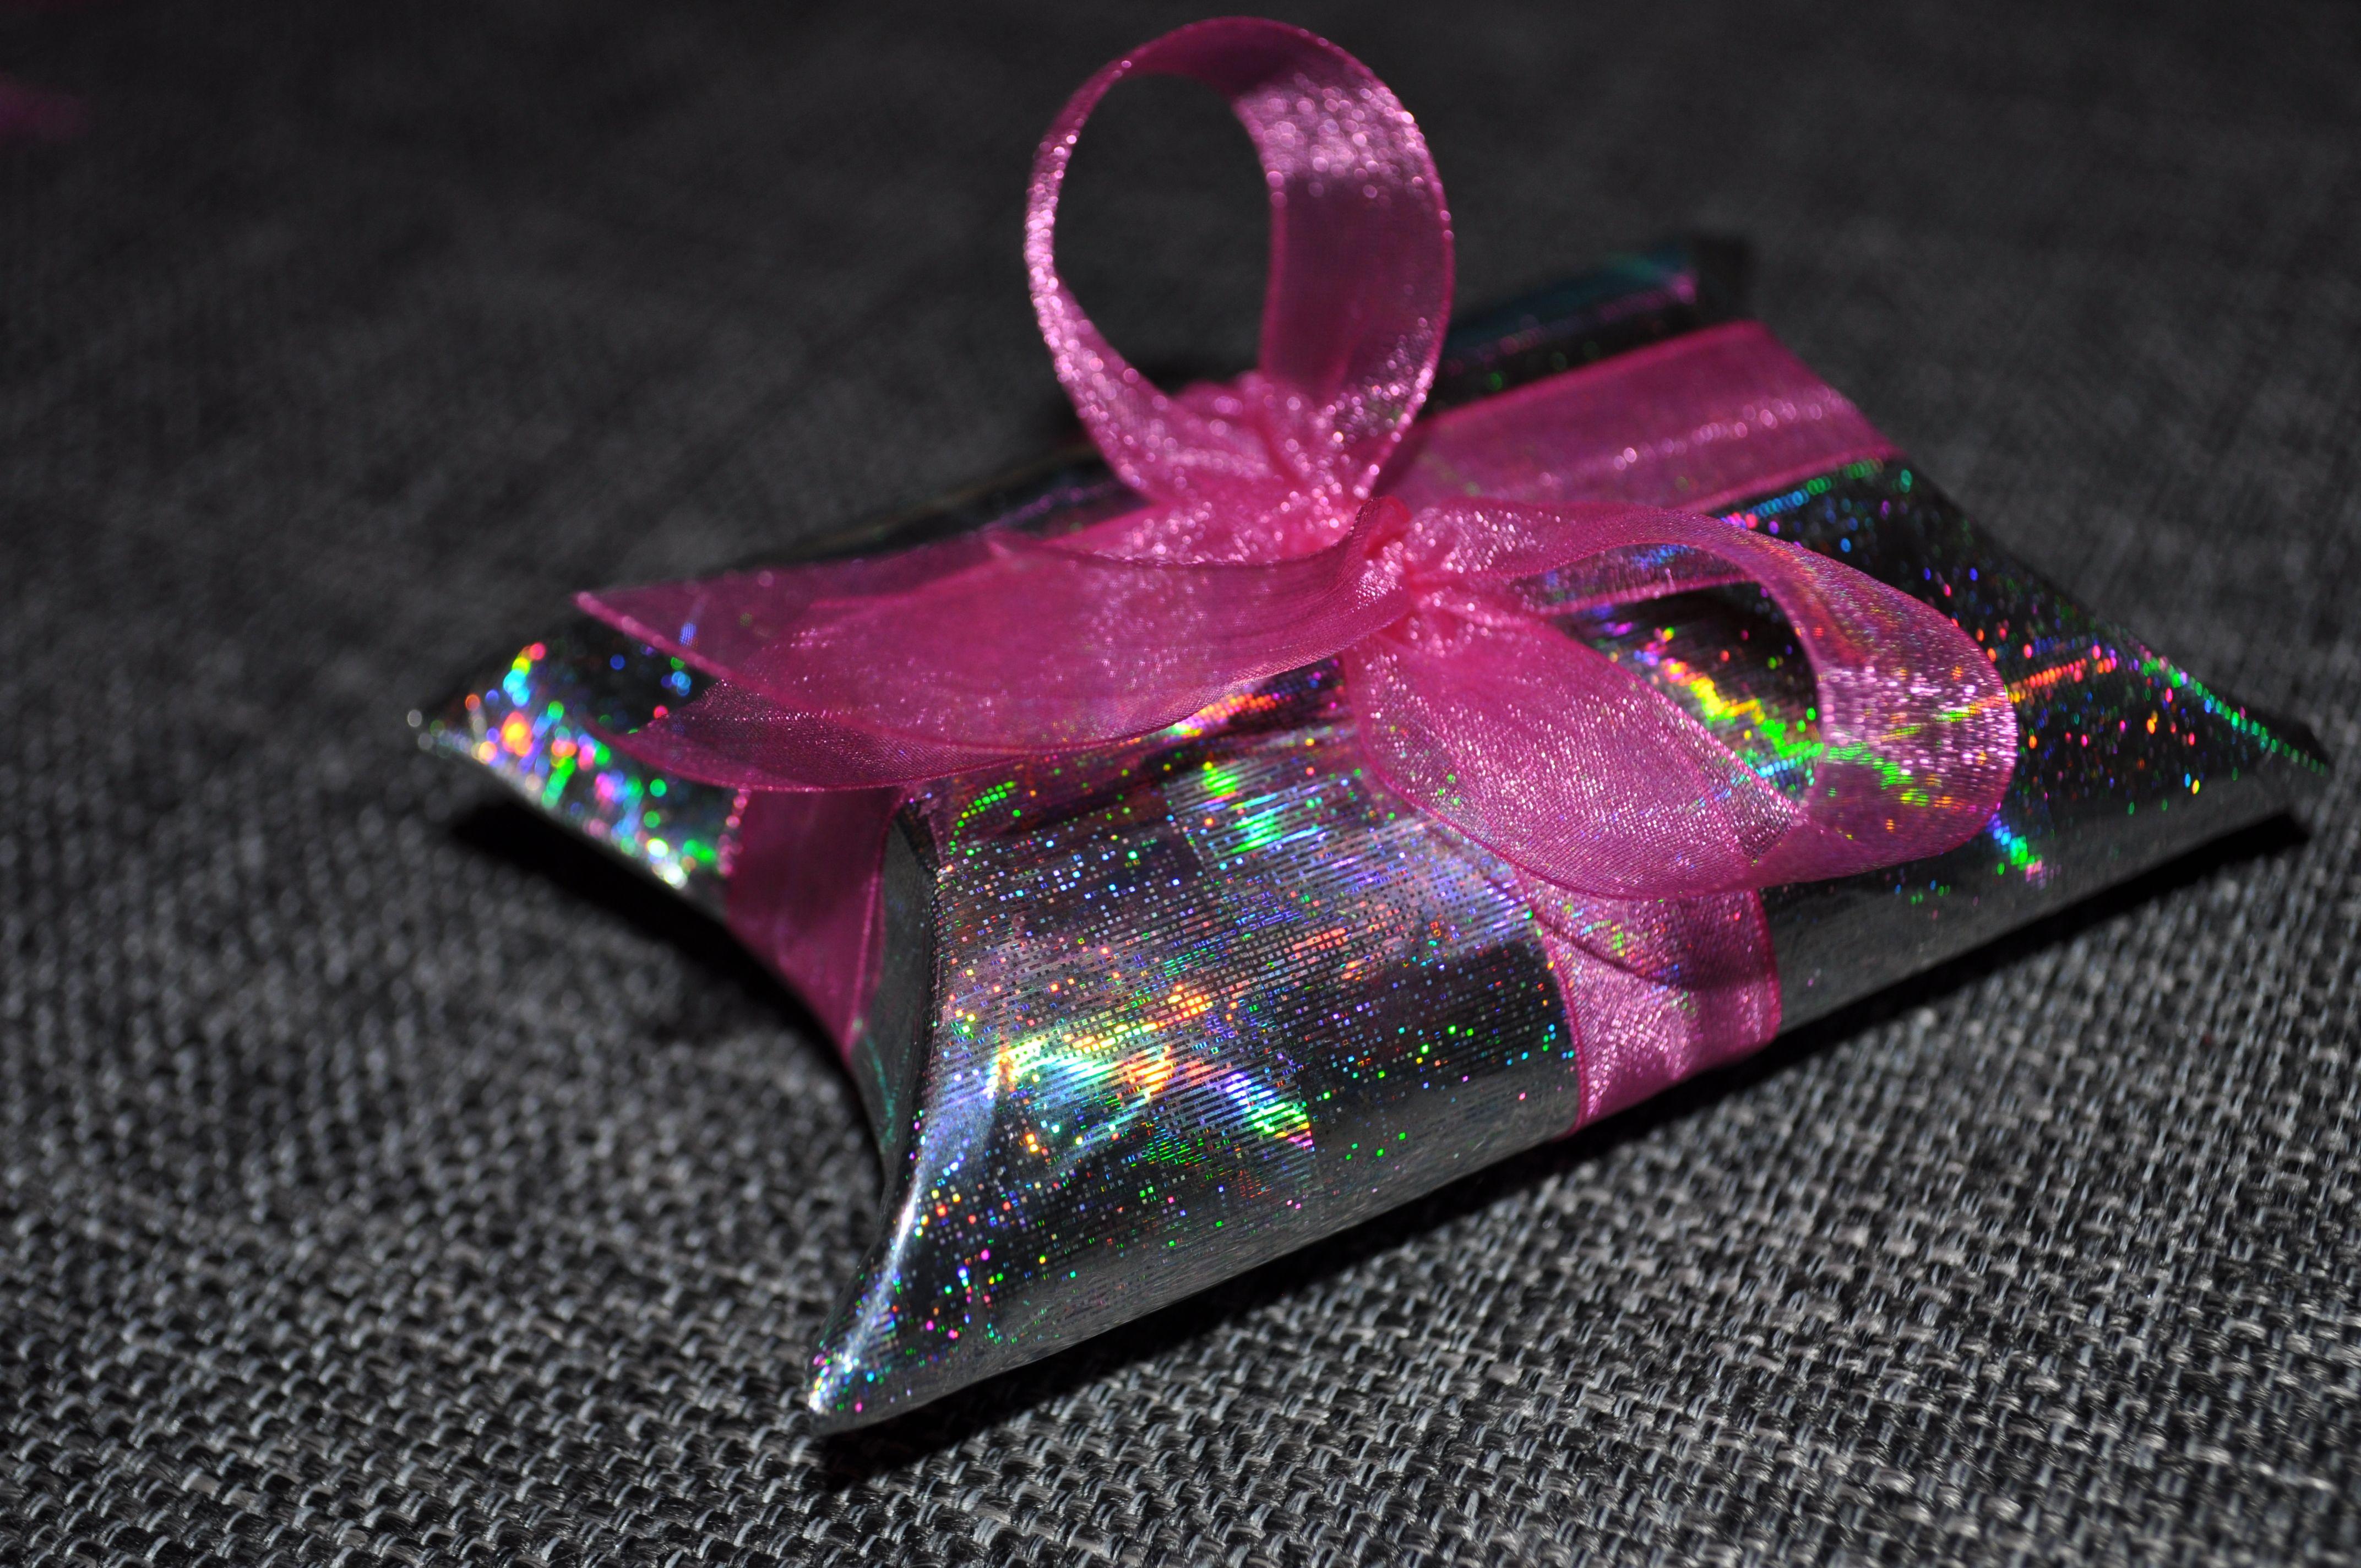 diy - gift box made from a toilet paper roll http://nervevrak.blogg.no/1417733267_diy__gaveeske__laget_.html